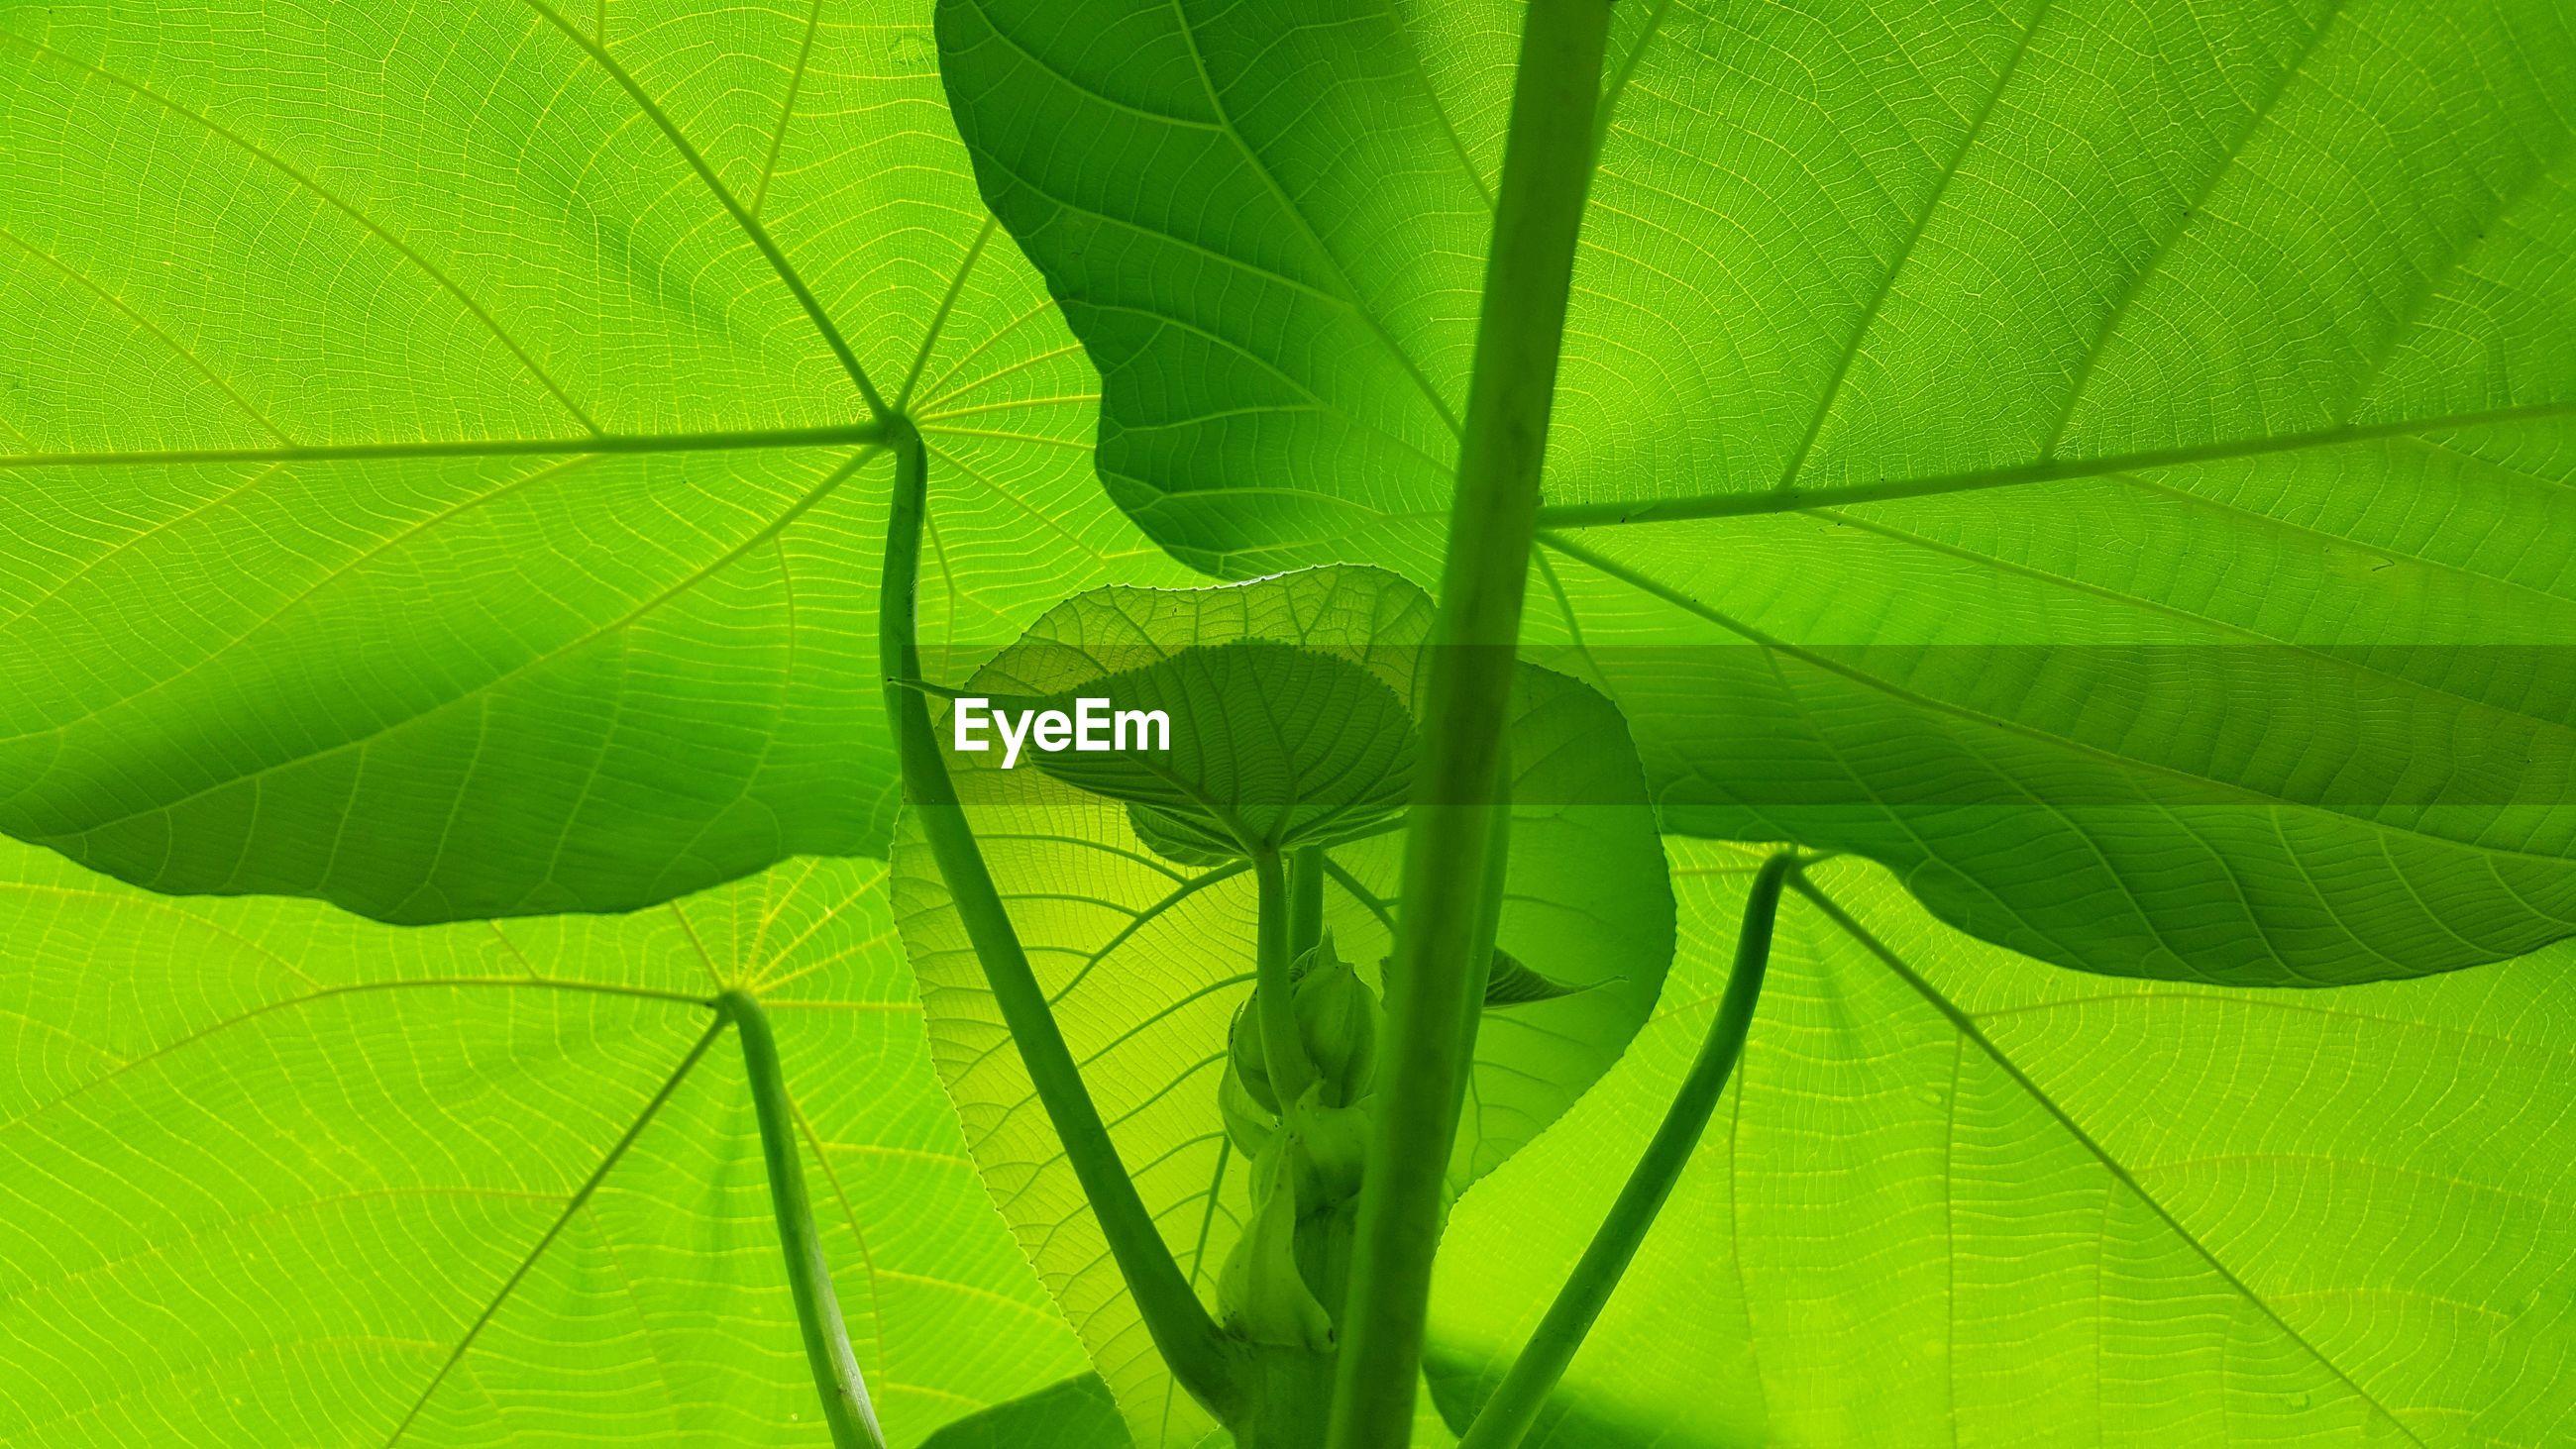 Close-up of green leaf